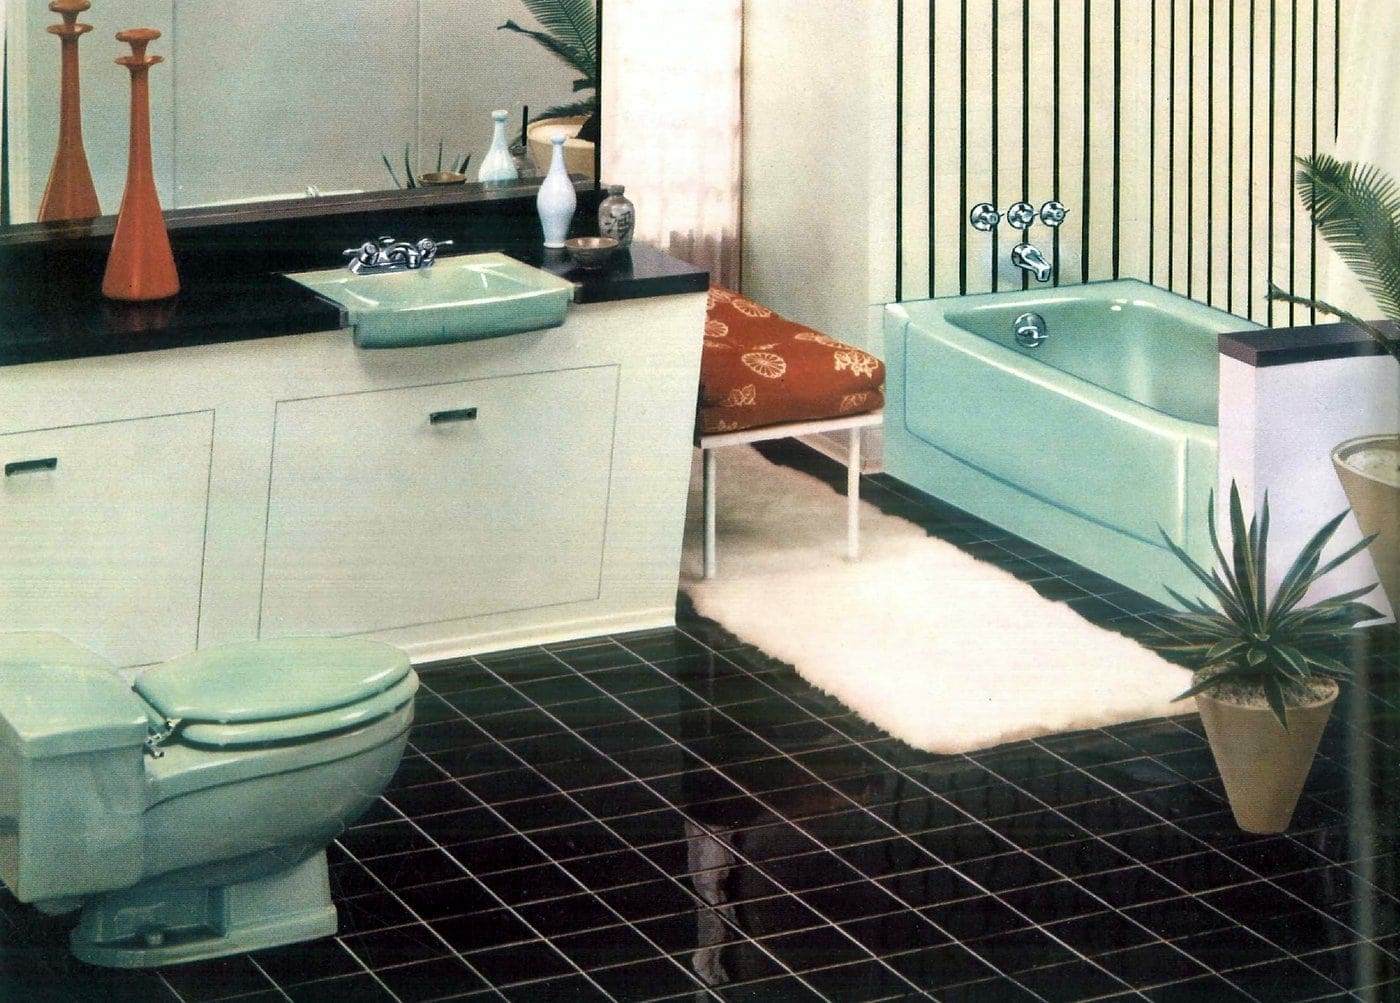 Sixties bathroom decorating ideas - 1960 (7)